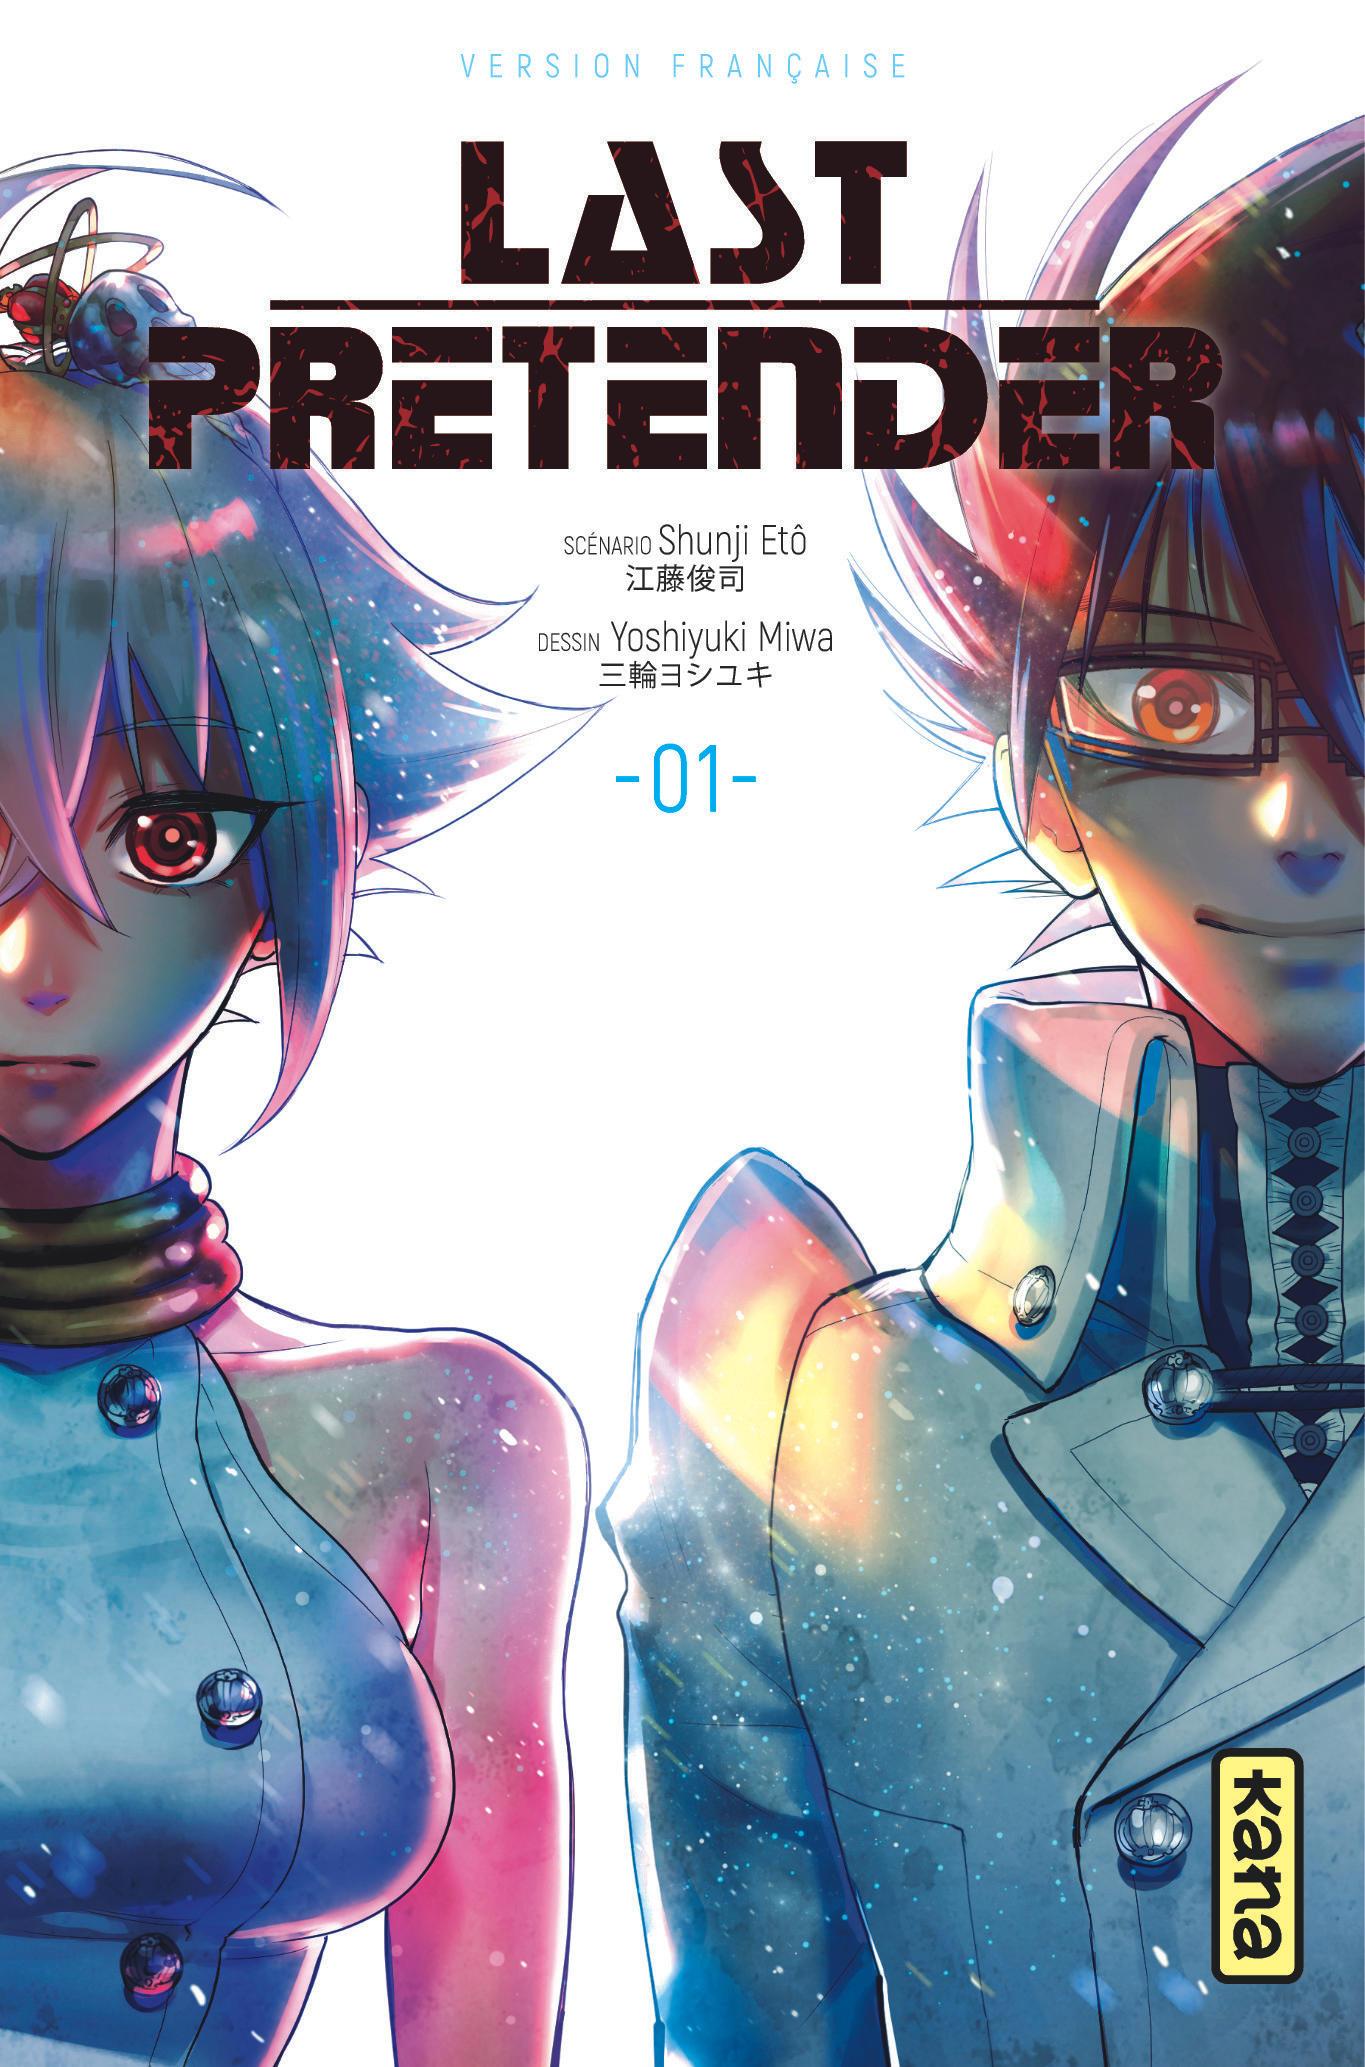 Last_pretender_01